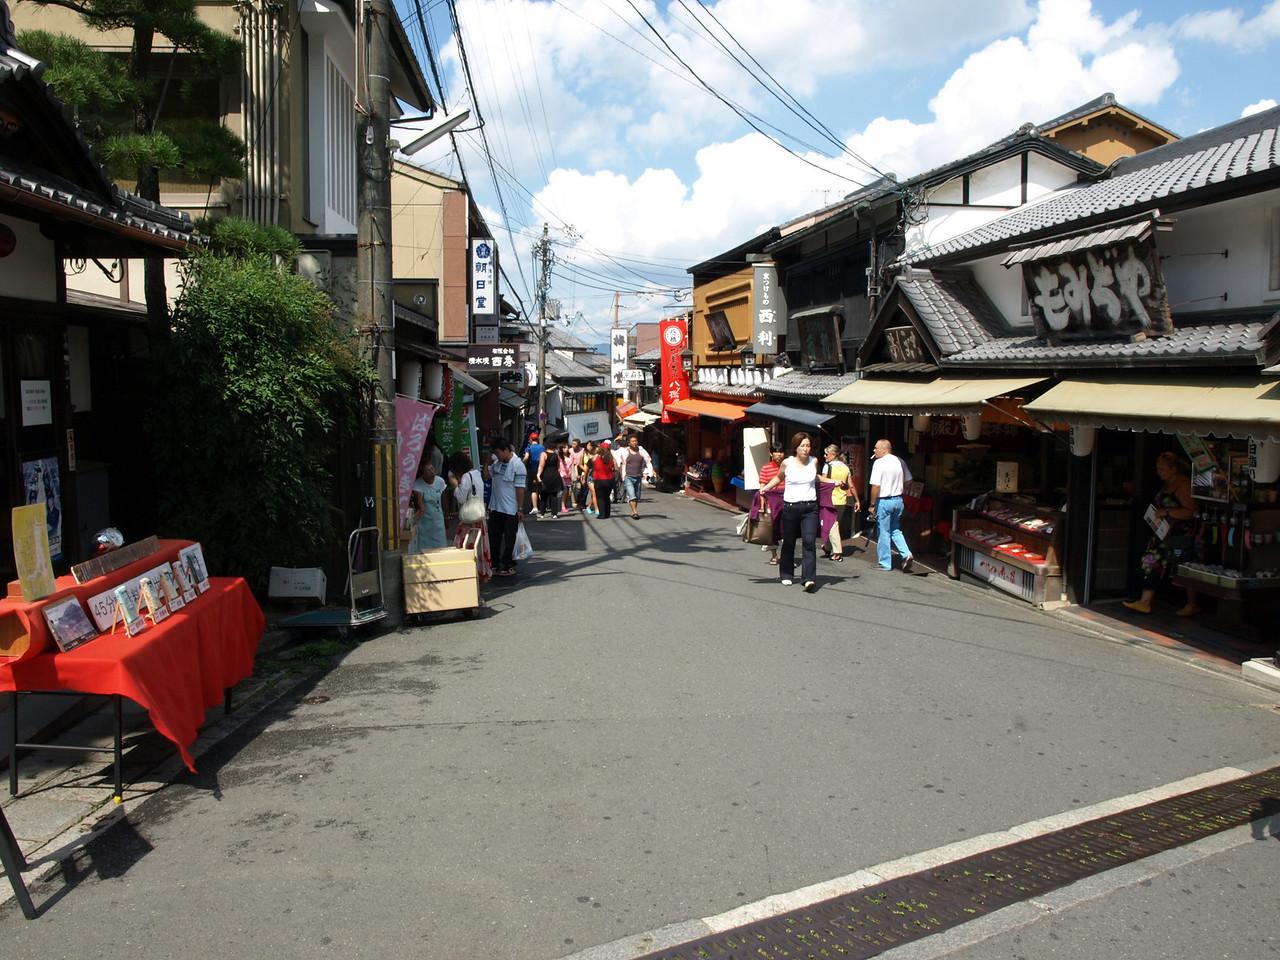 We're looking down Kiyomizuzaka Street as we prepare to continue our spiritual walk.